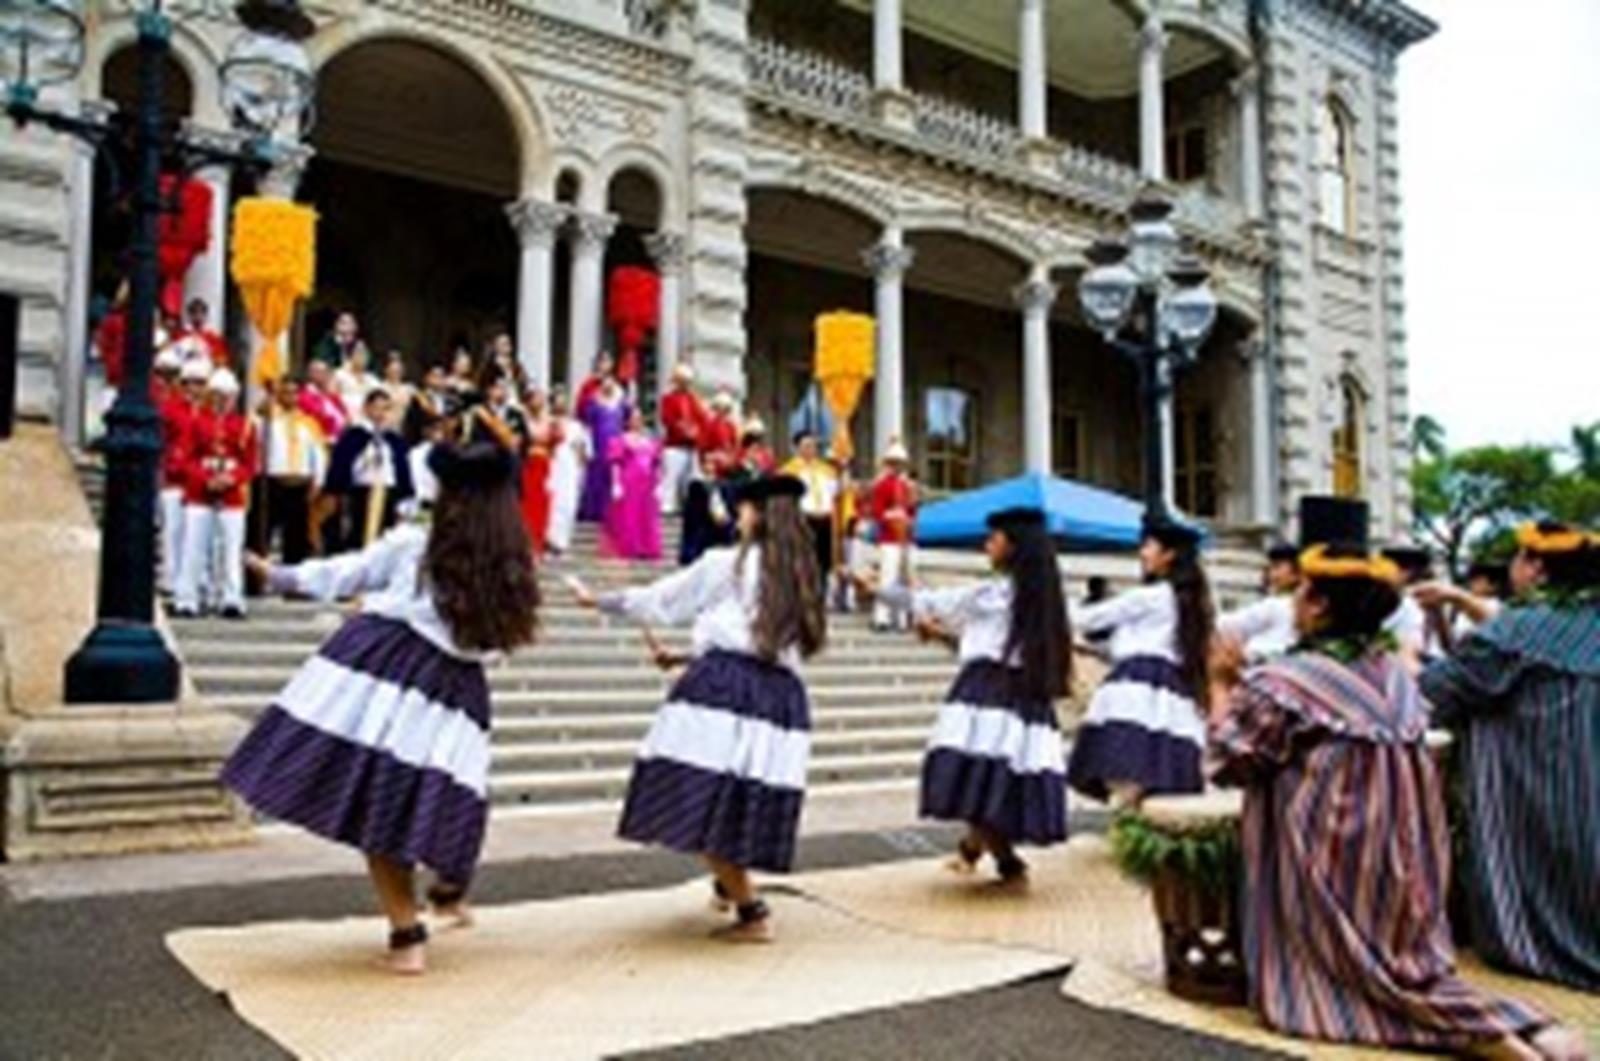 The Aloha Festival